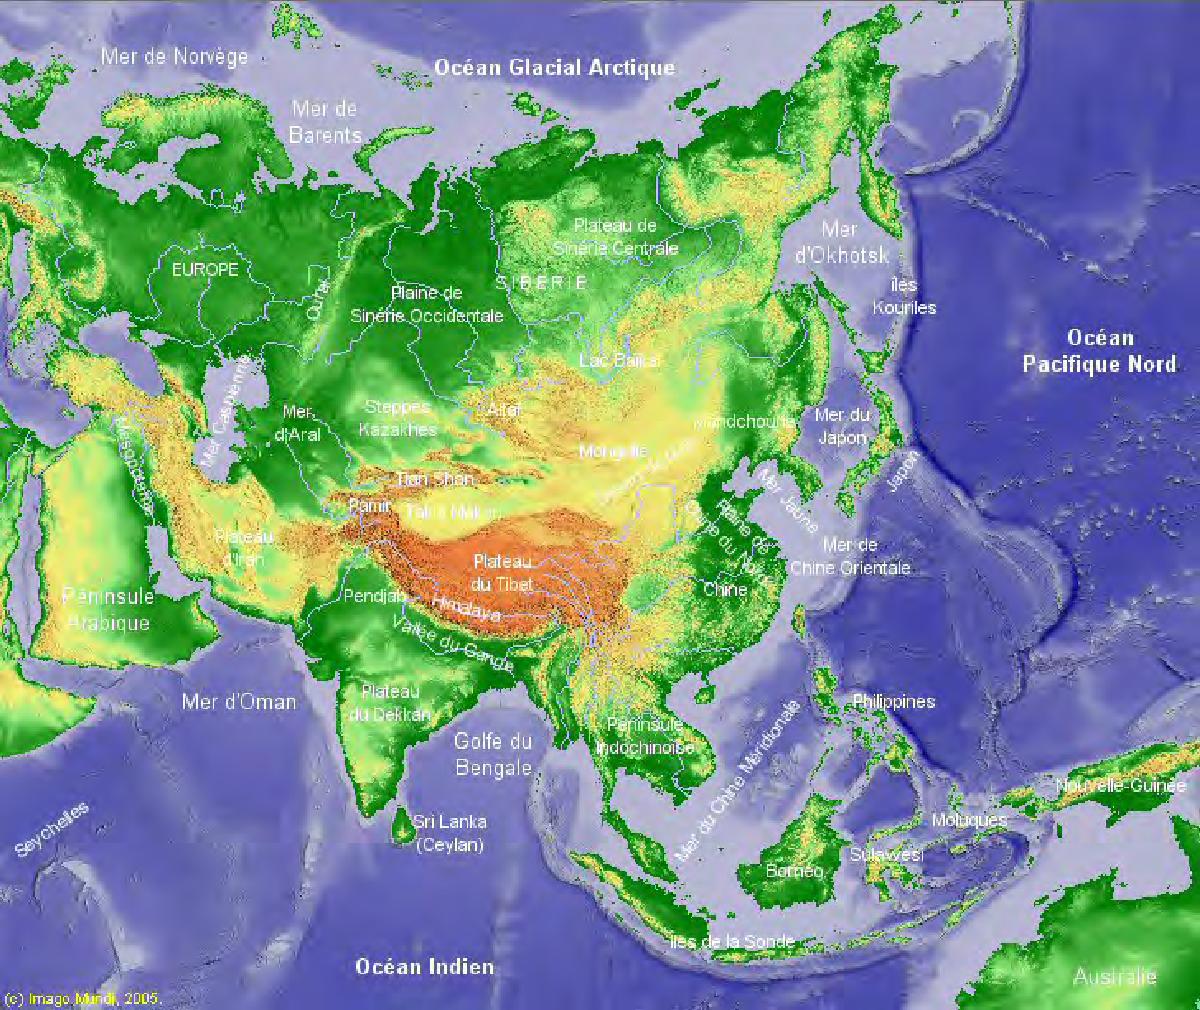 Carte Geo De Lasie.Figure 1 1 From Histoire Du Peuplement De L Asie Orientale